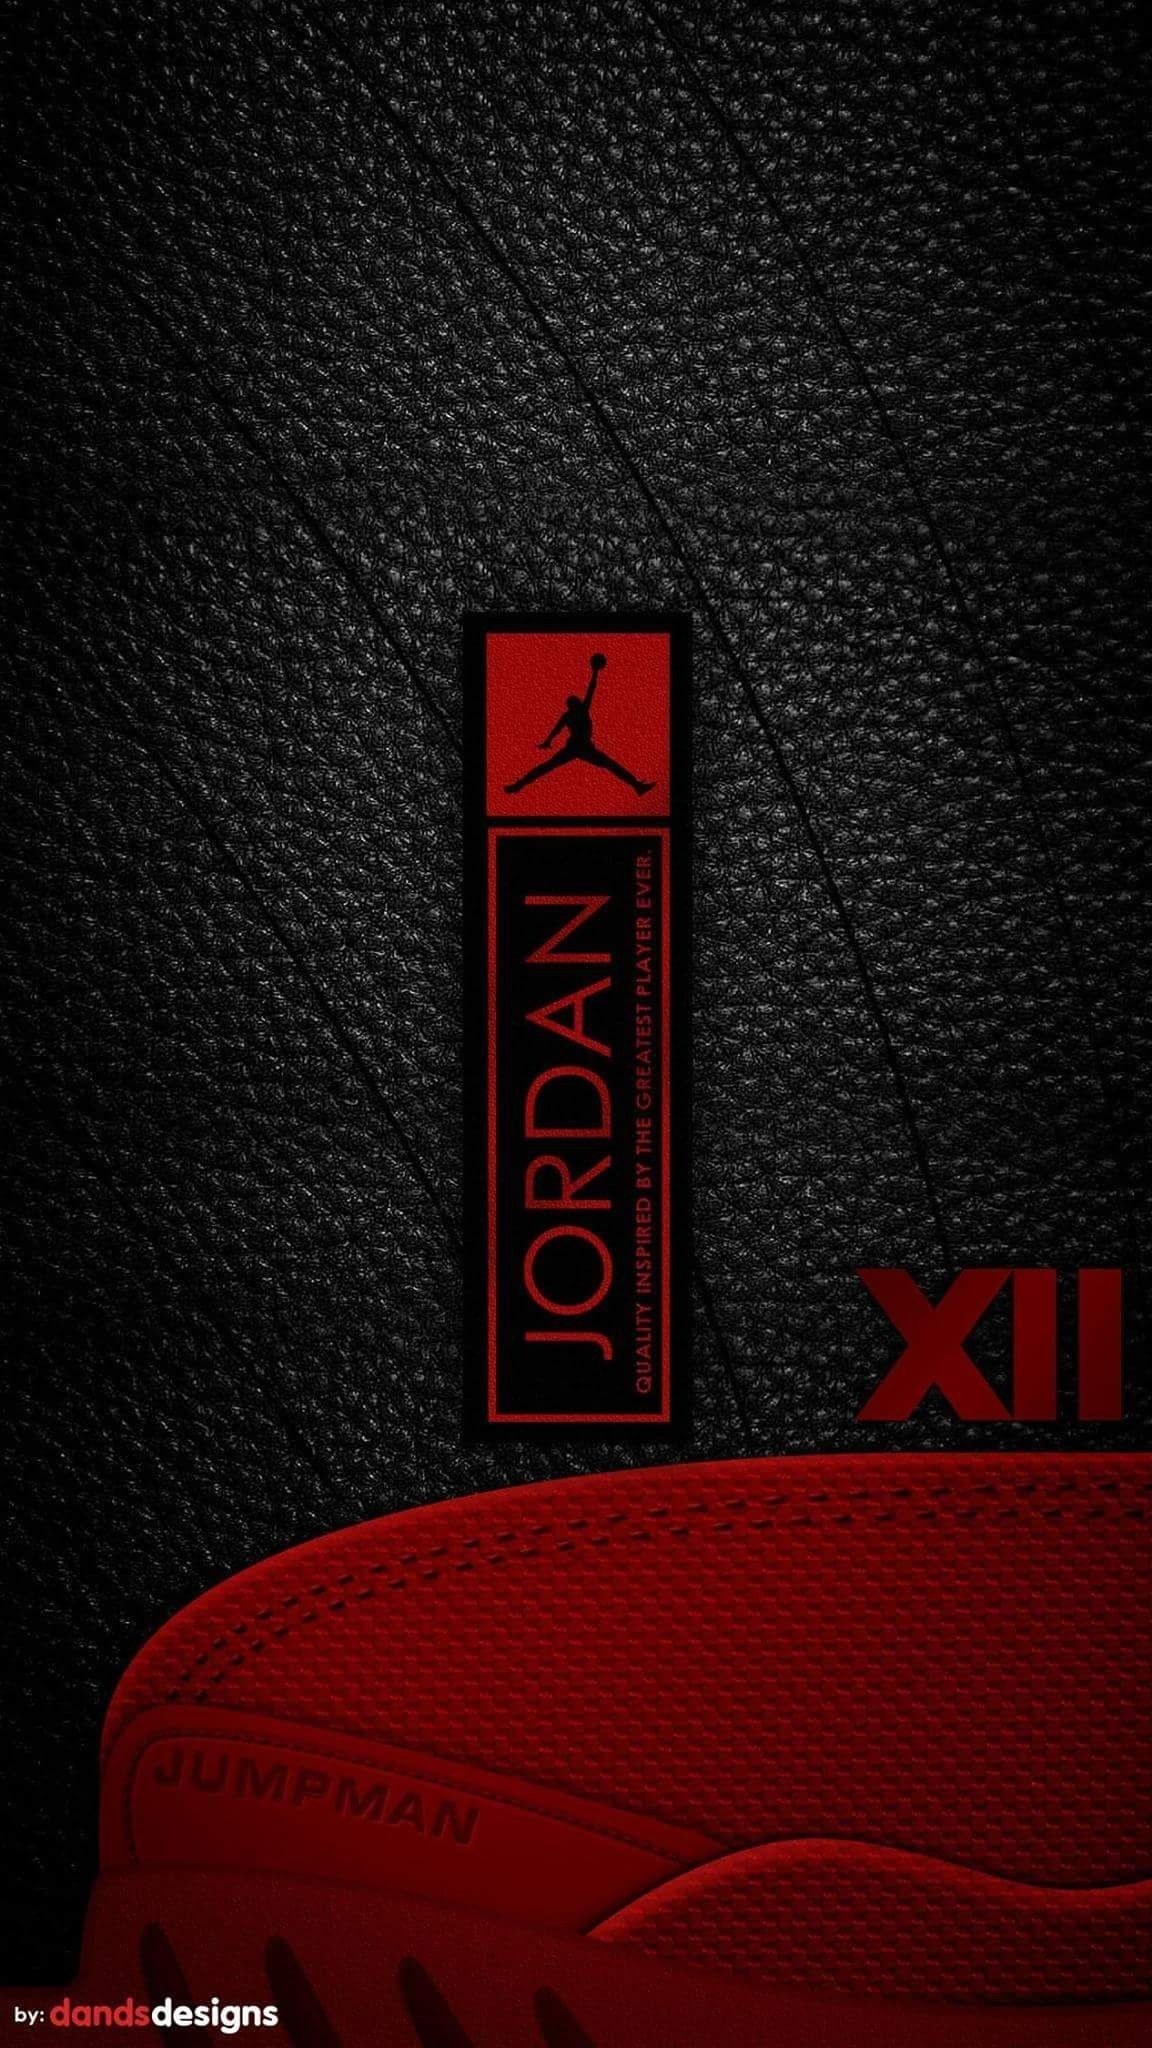 Nike wallpaper image by Wade on Air jordan Cool nike